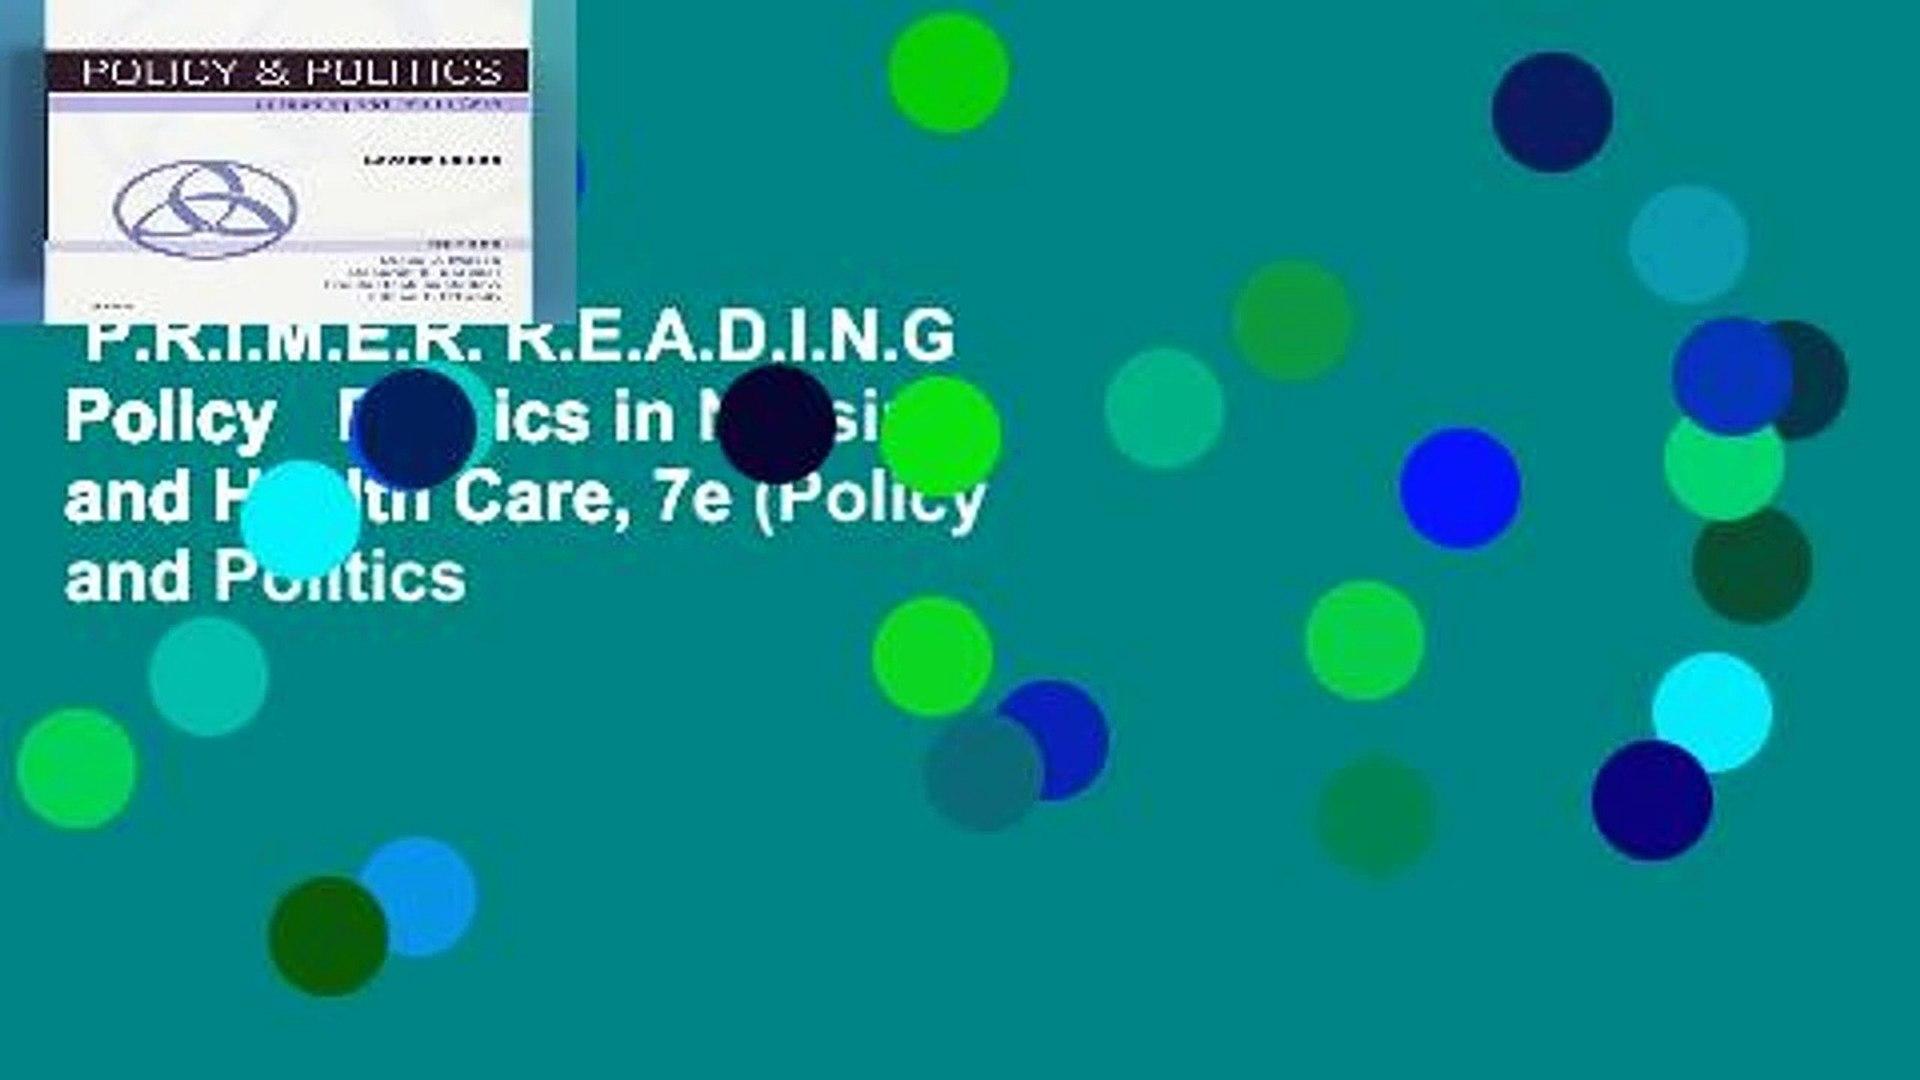 P.R.I.M.E.R. R.E.A.D.I.N.G  Policy   Politics in Nursing and Health Care, 7e (Policy and Politics